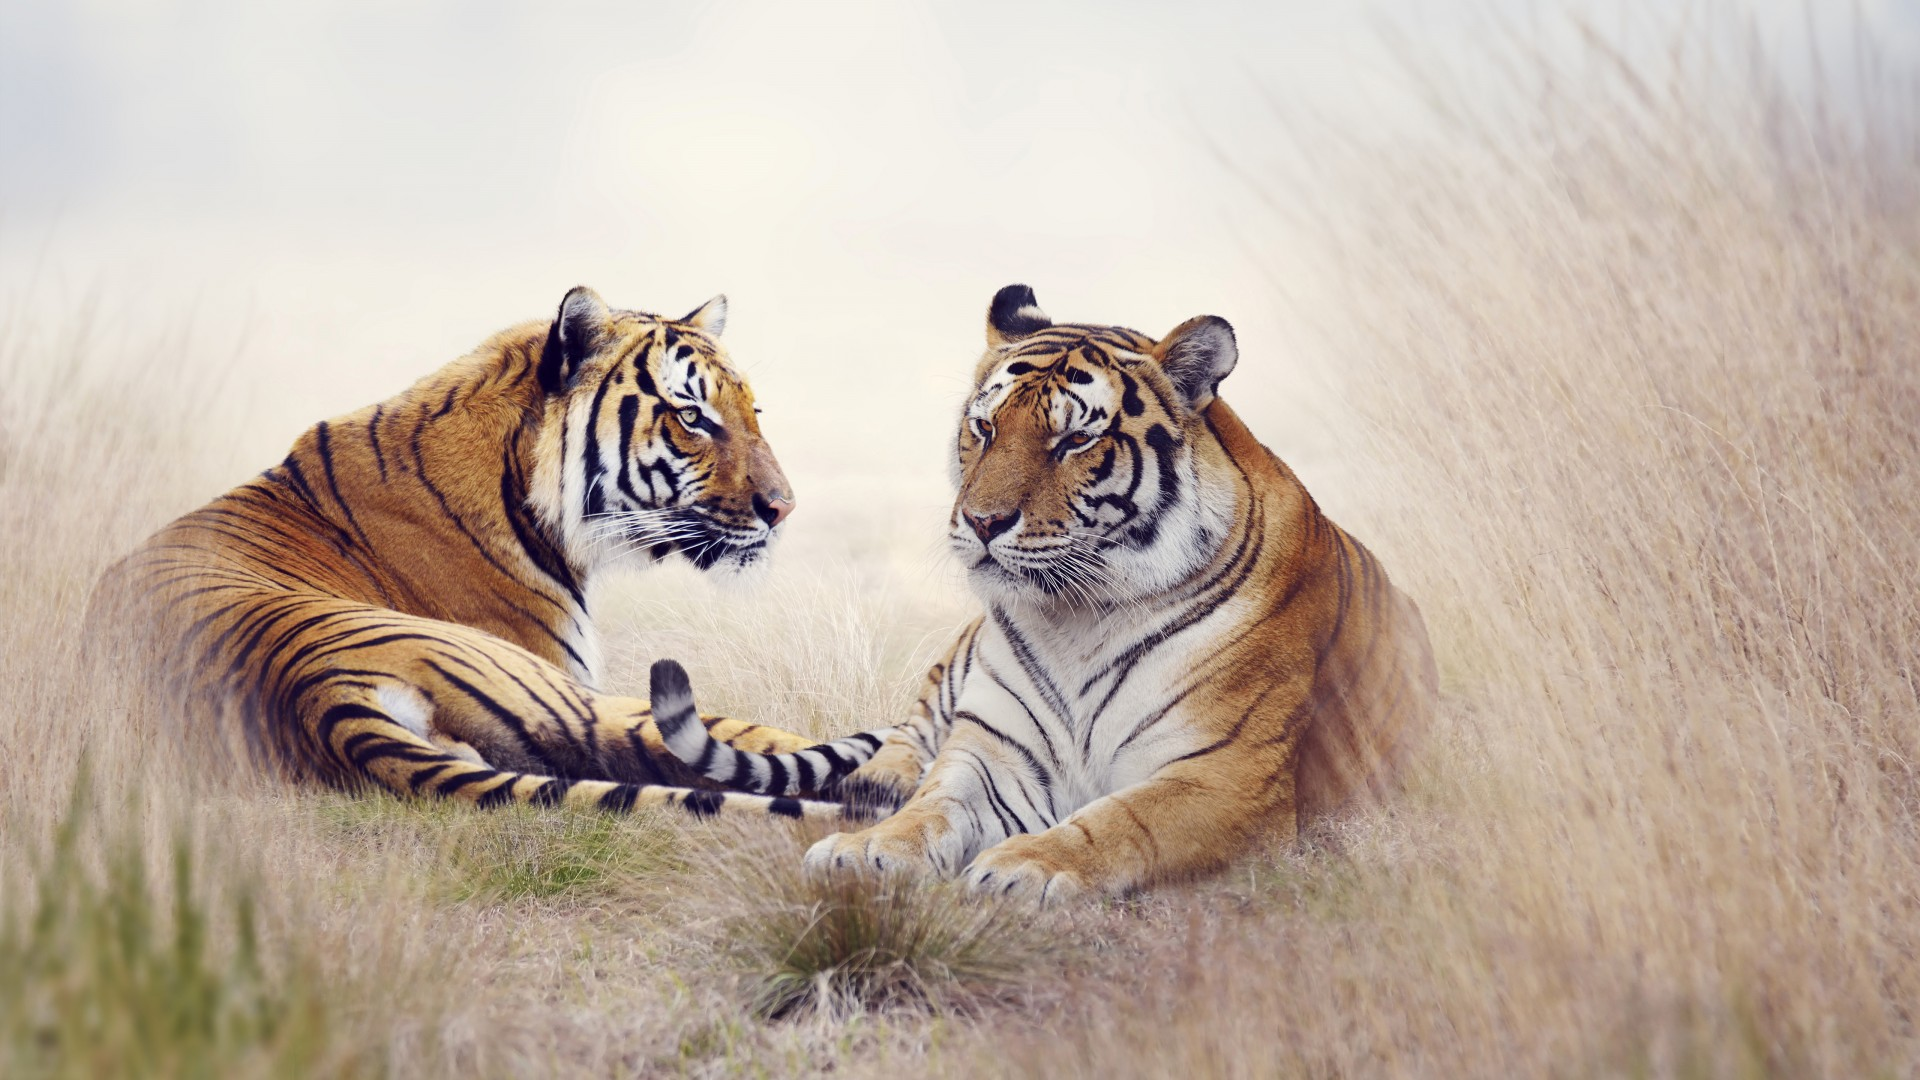 Cute Bengal Cats Wallpaper Tiger Pair 5k Wallpapers Hd Wallpapers Id 18449